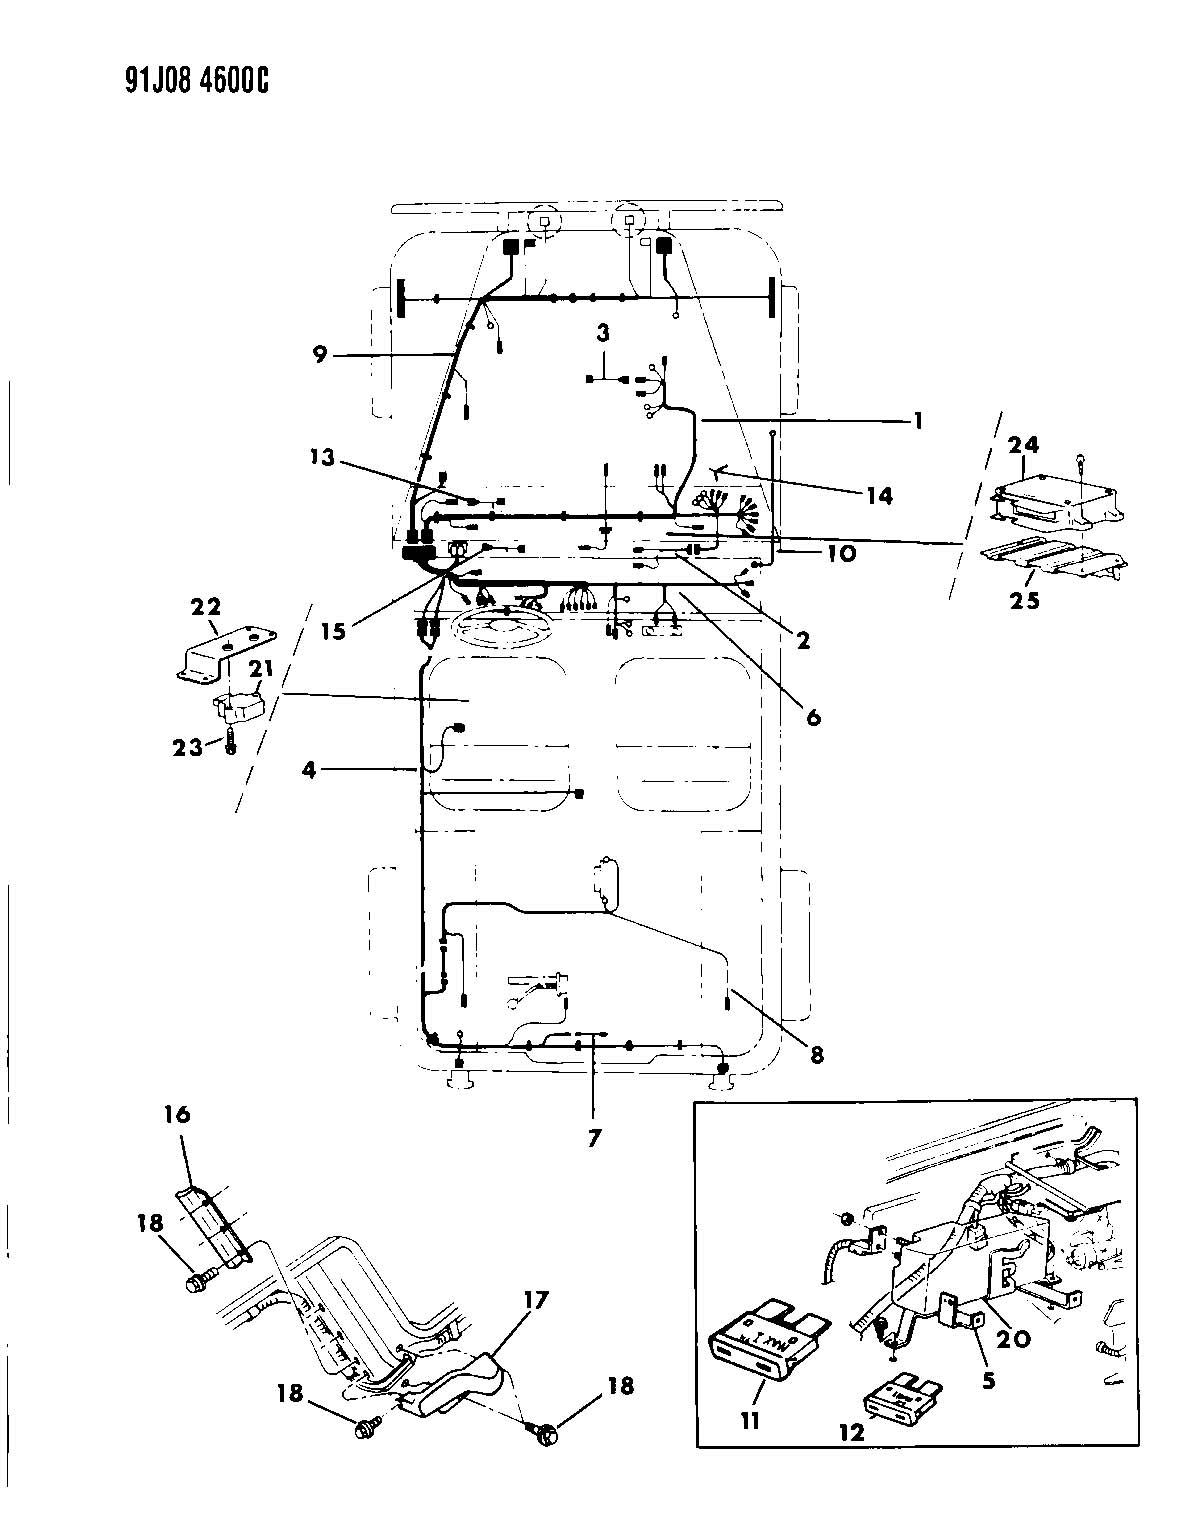 1986 audi 4000 s fuse box diagram